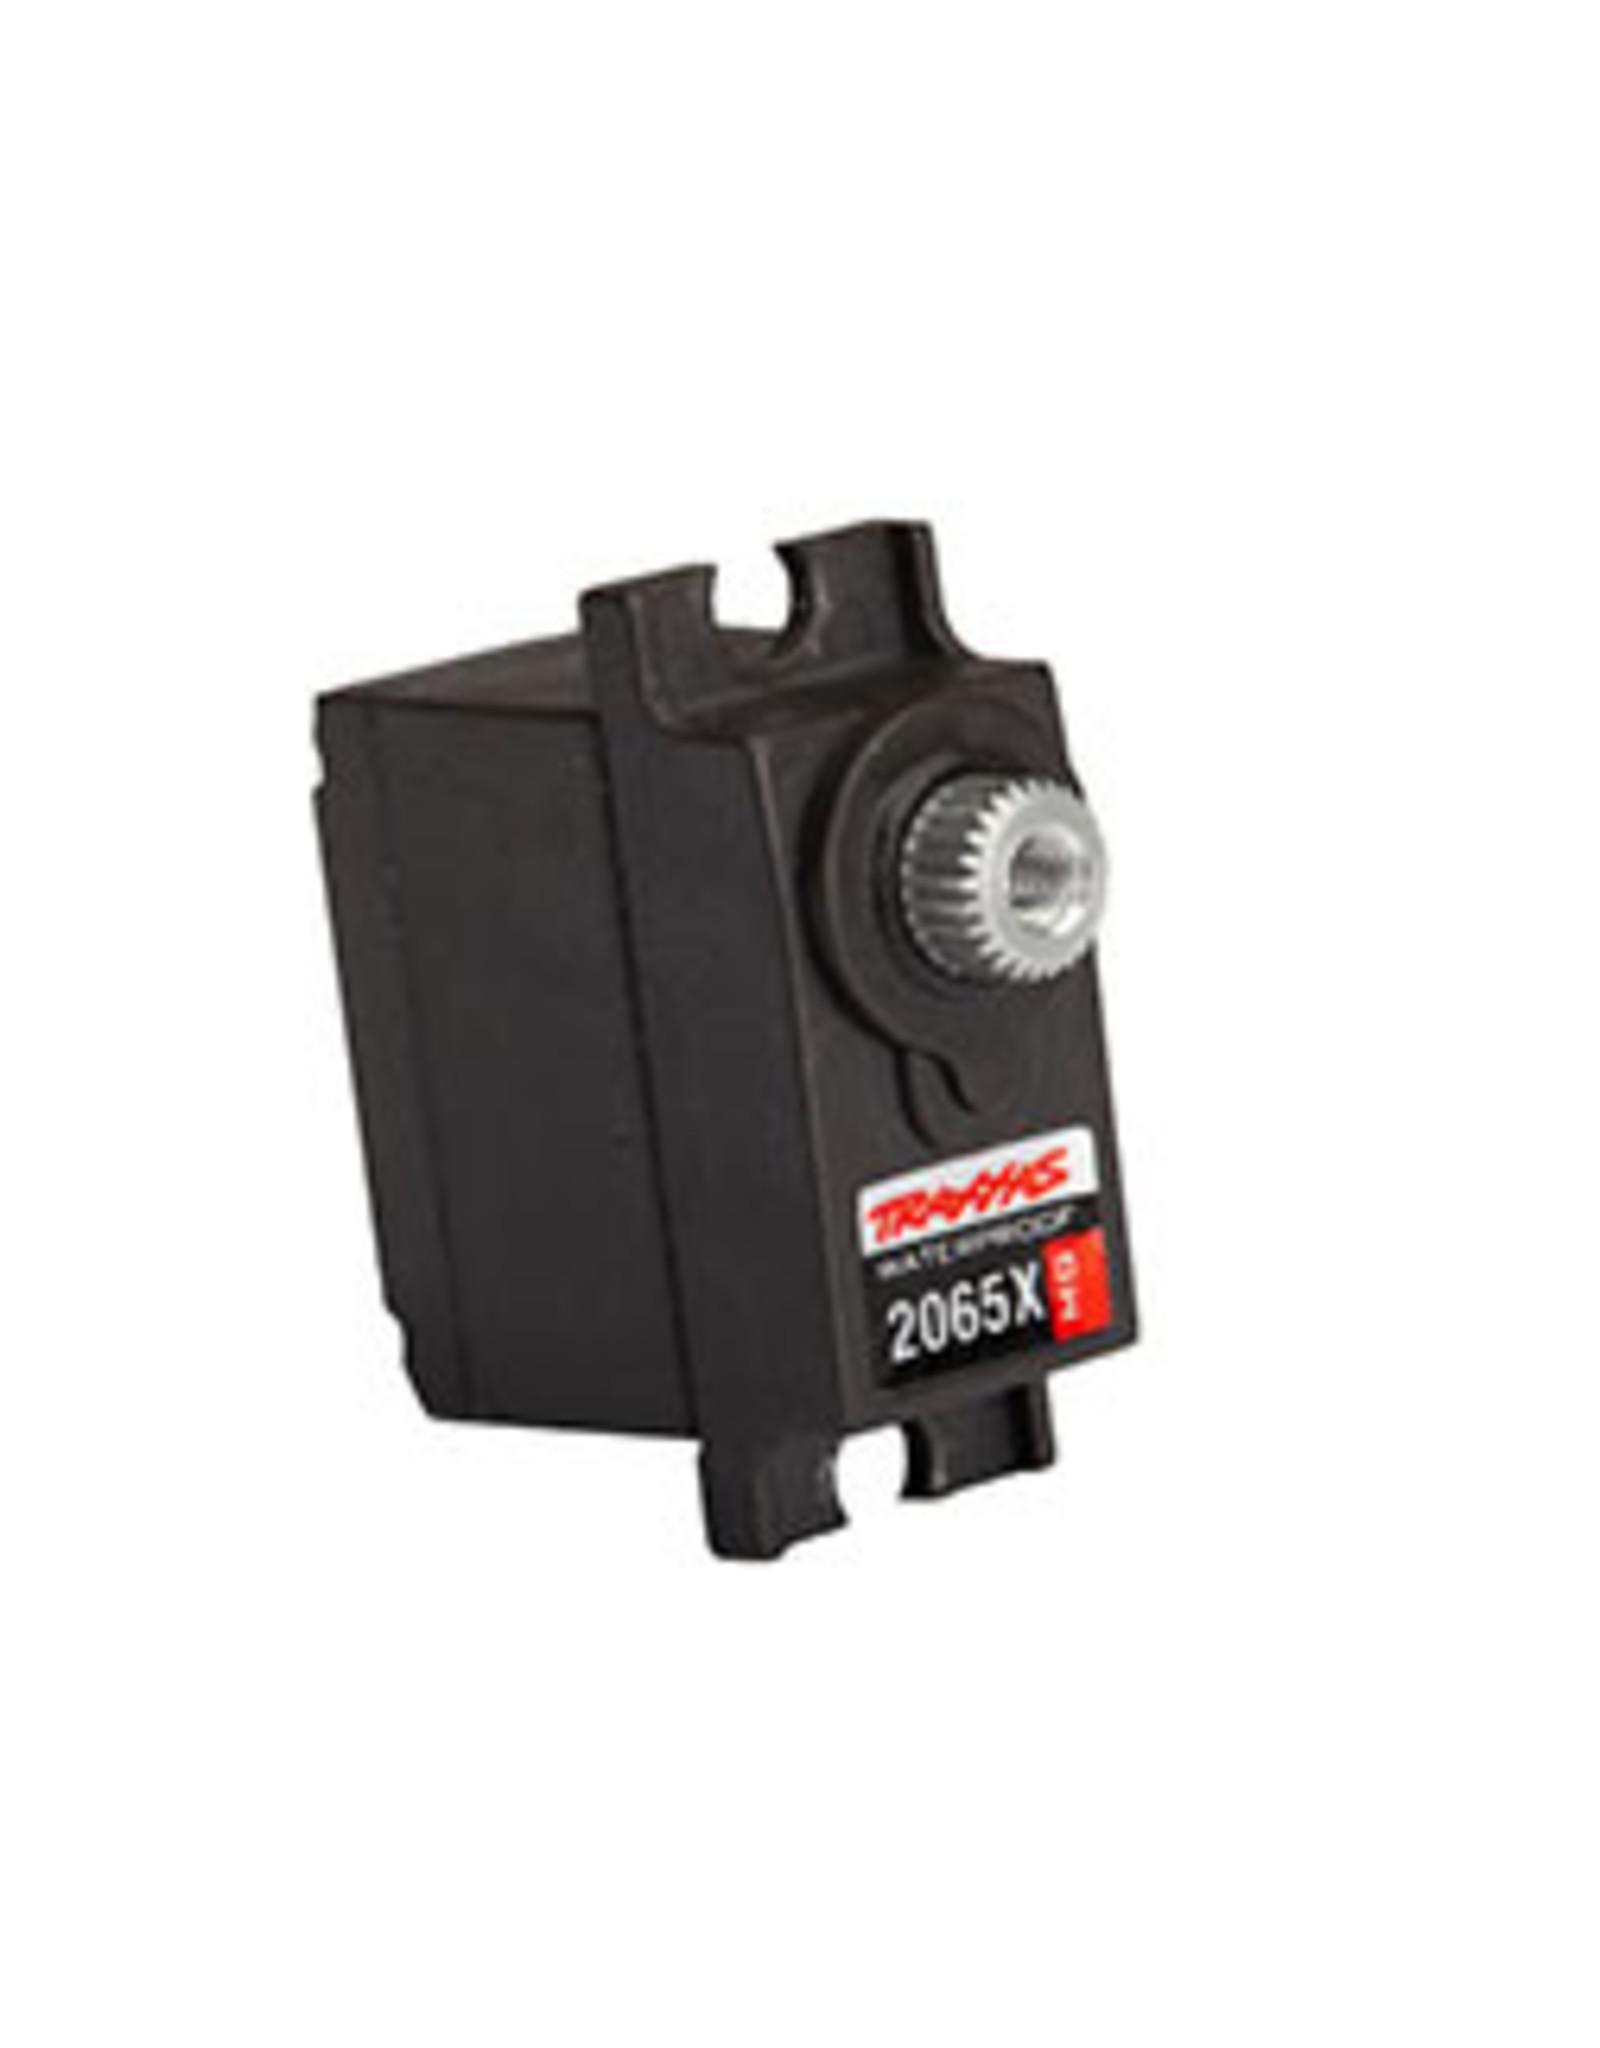 Traxxas Servo, sub-micro, waterproof, metal gear  (TRA2065X)